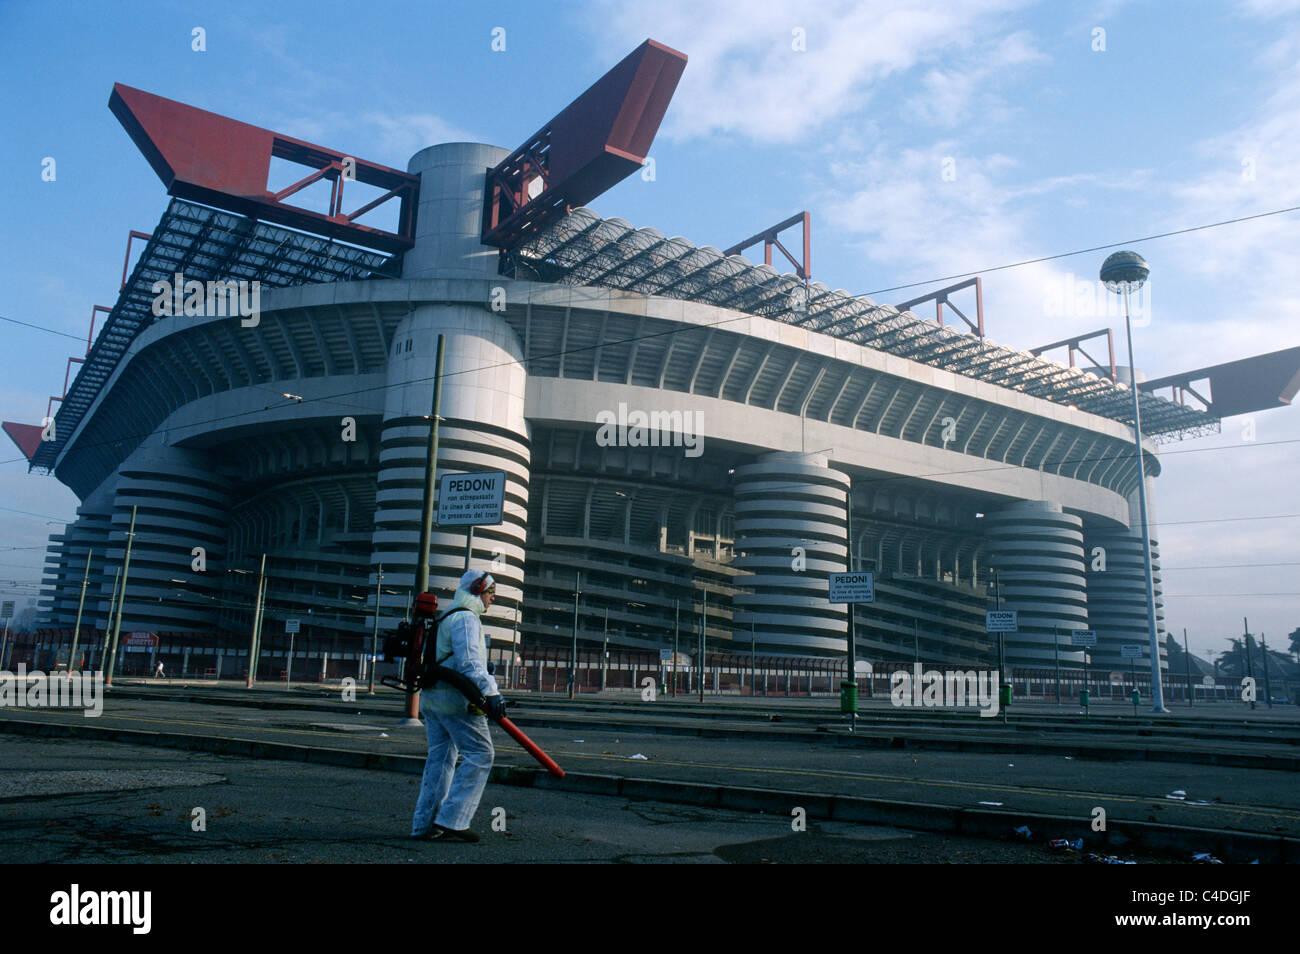 San Siro football stadium Stadio Giuseppe Meazza Milan Italy. Stock Photo